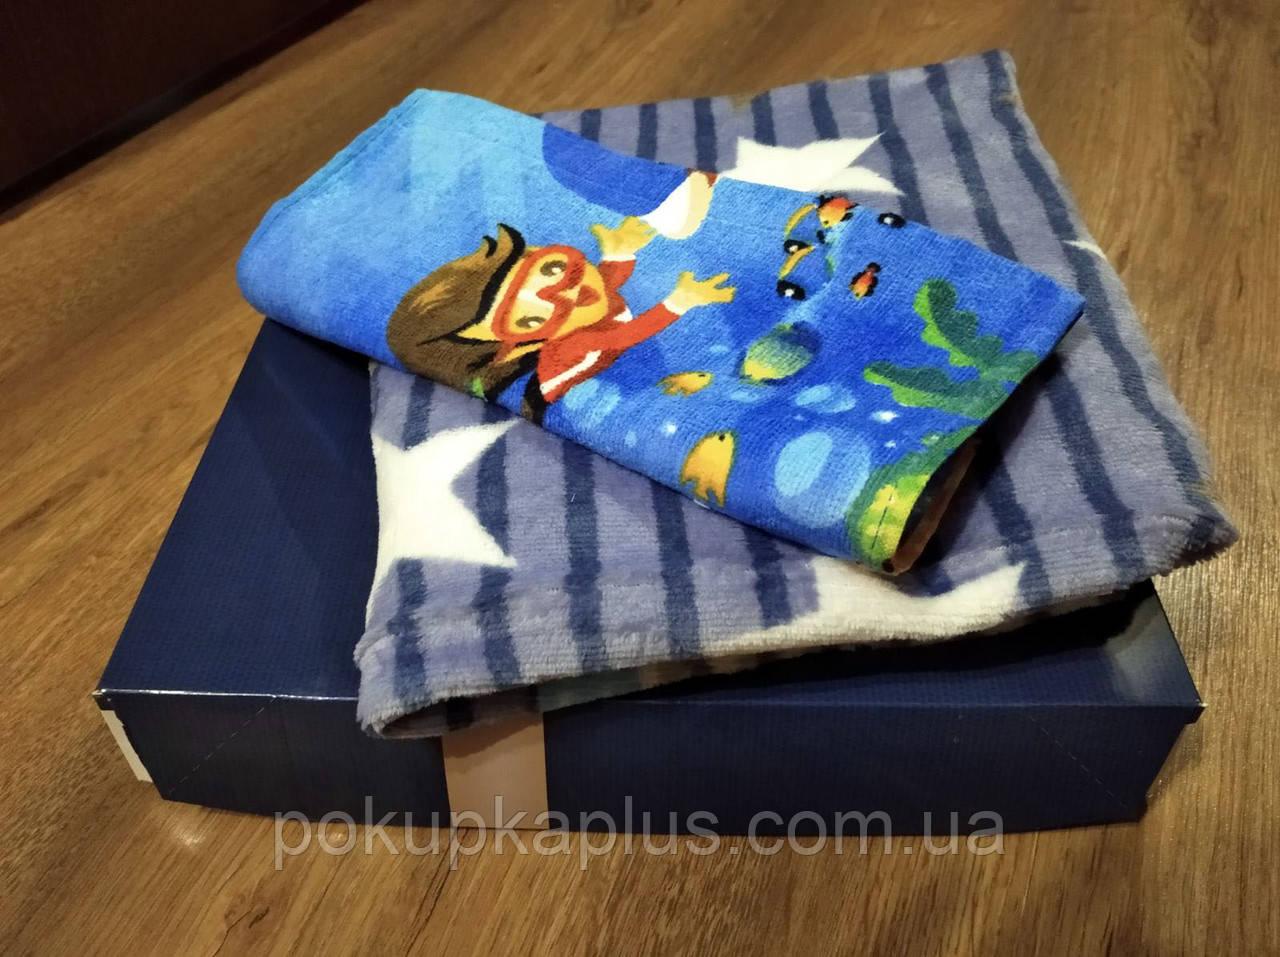 Плед детский + полотенце микрофибра 105х105 в подарочной коробке